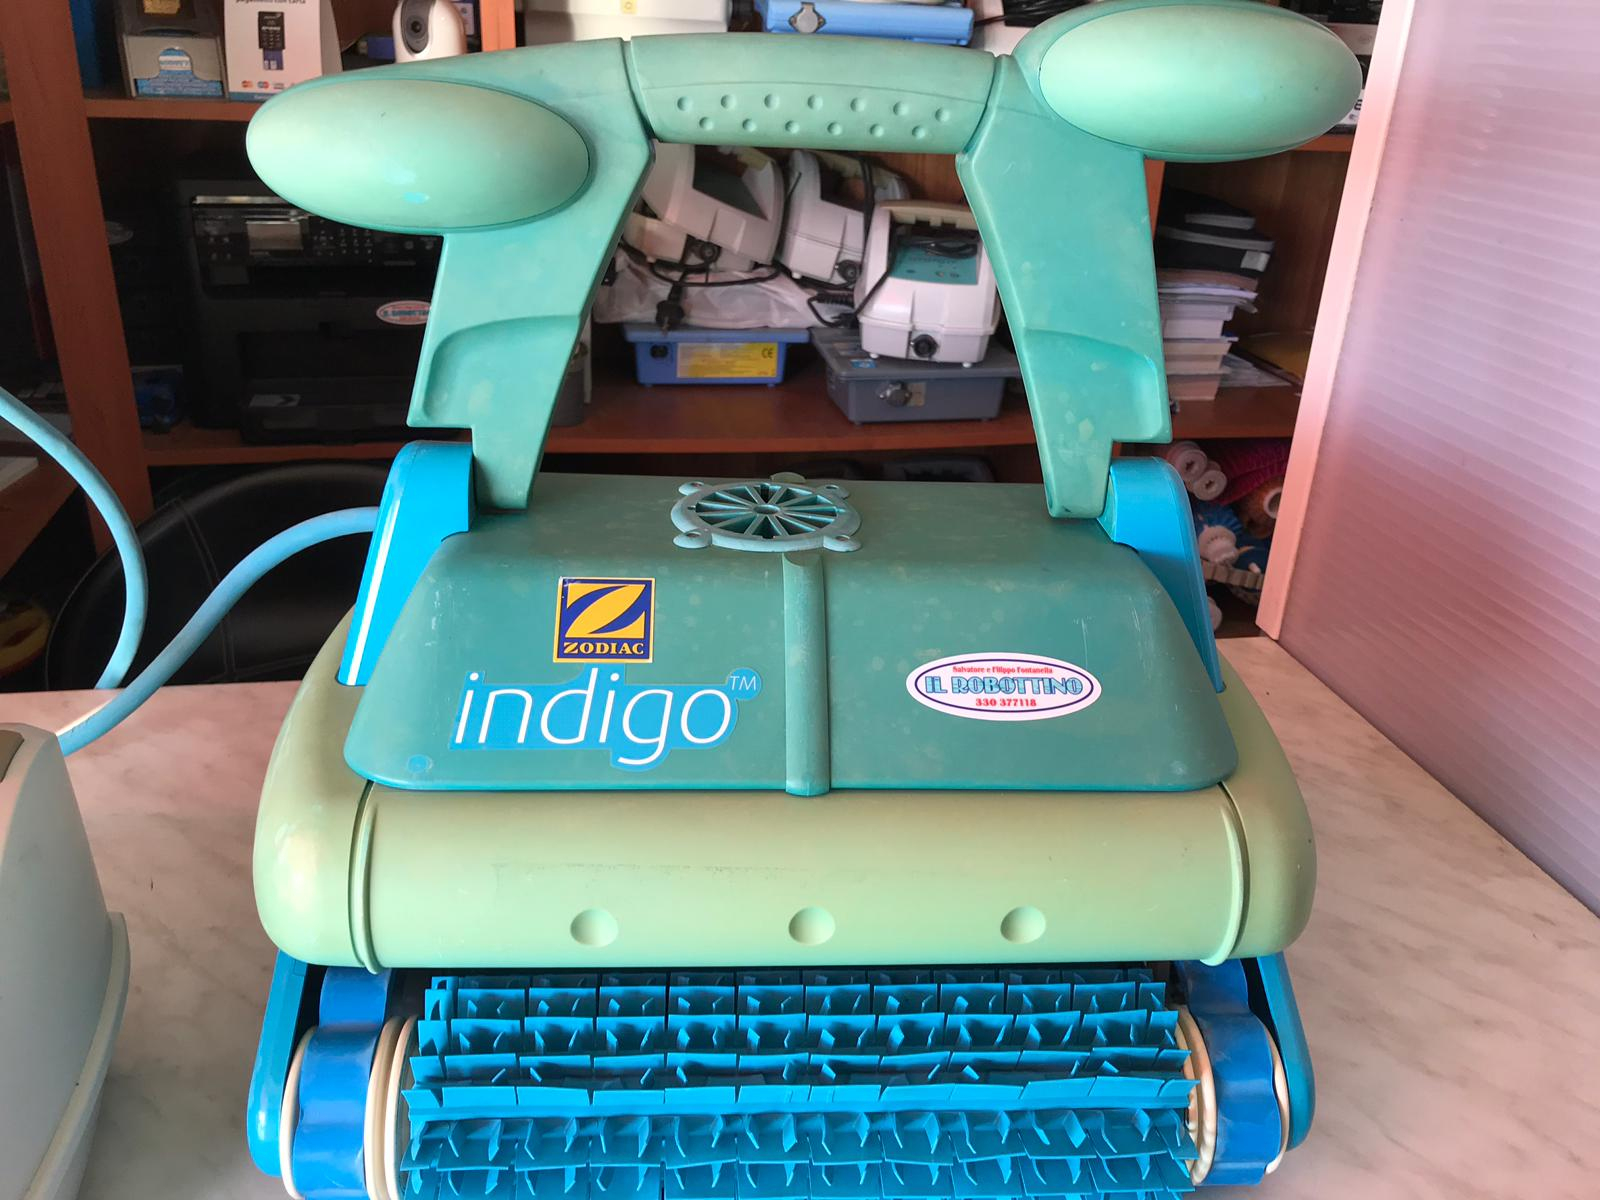 Robot Piscina Zodiac Indigo serapportantà Robot Piscine Zodiac Indigo